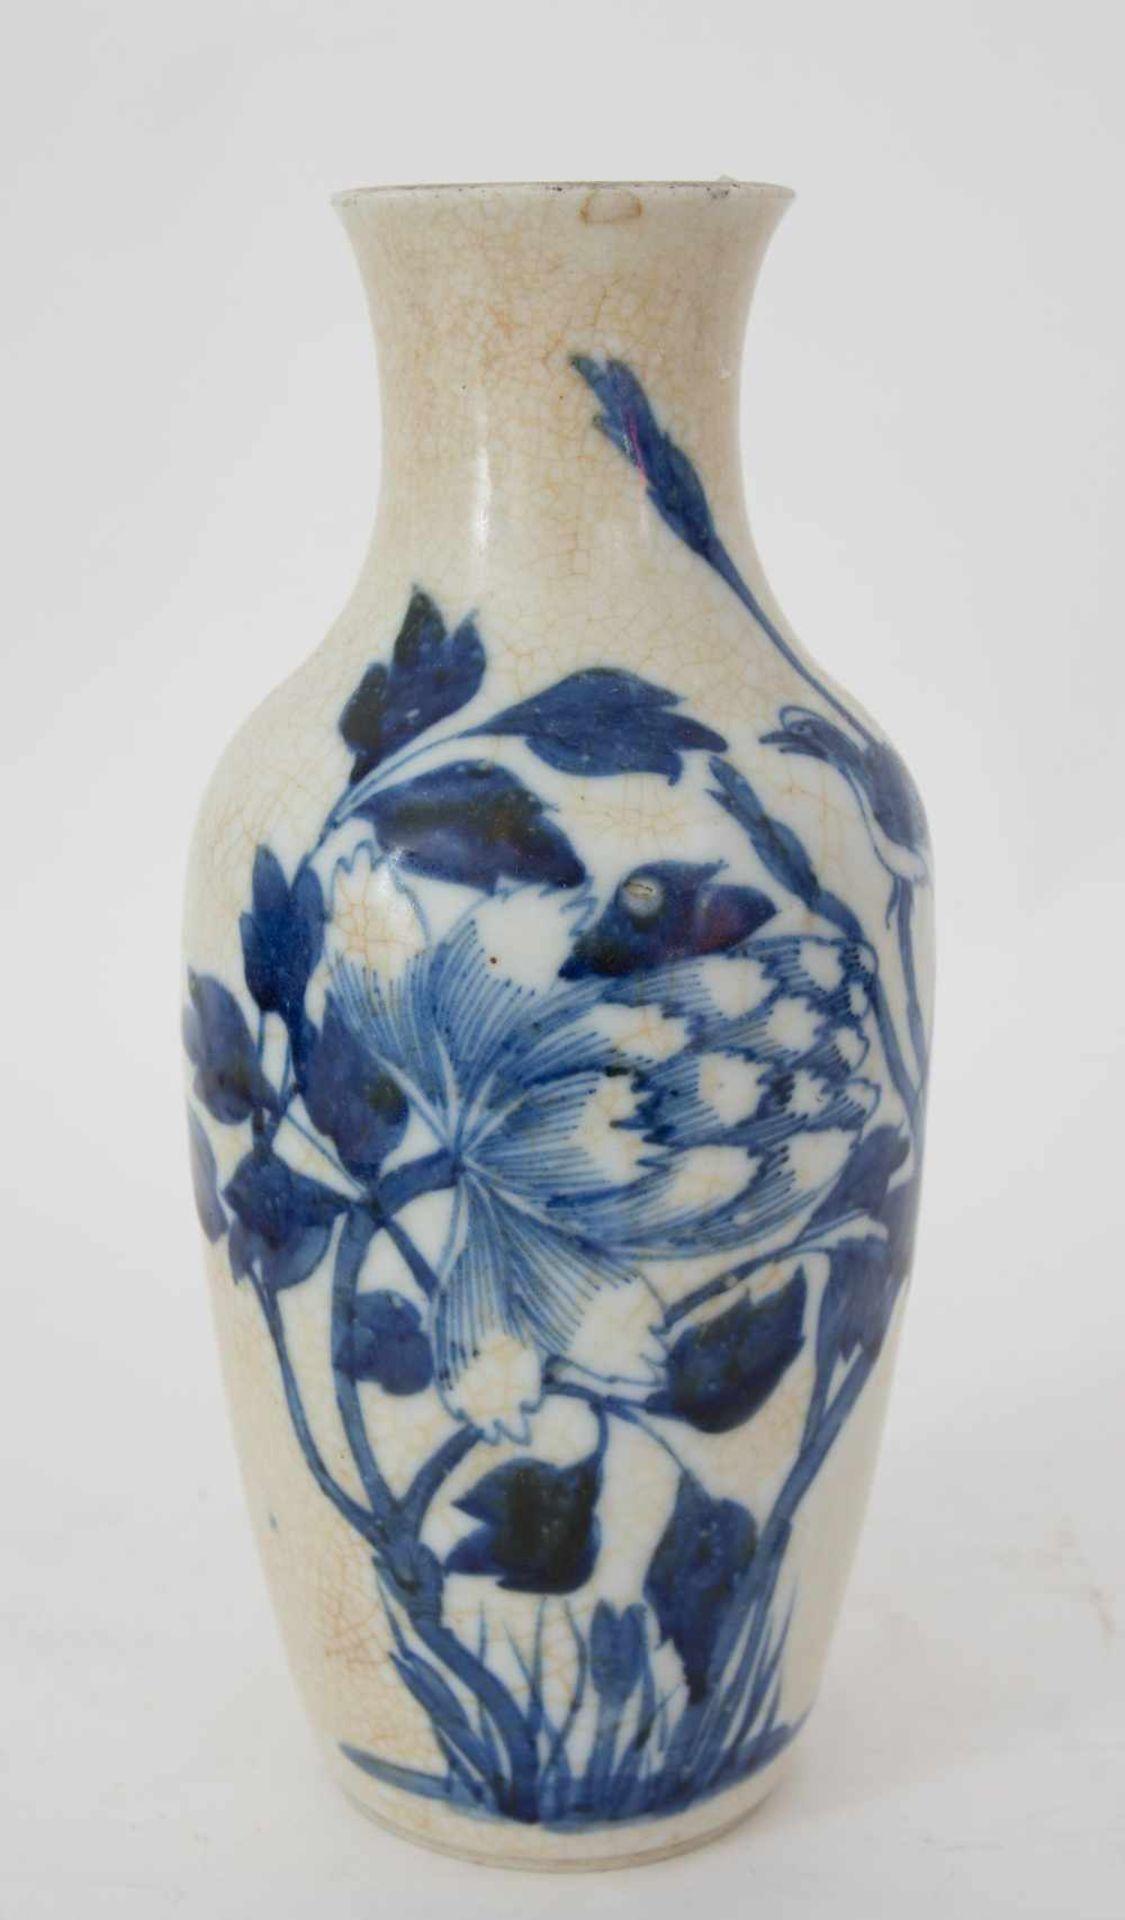 Los 17 - CHINESE CERAMIC VASE, painted in blue Blue painted ceramic vase, China,23 x 7 cm.